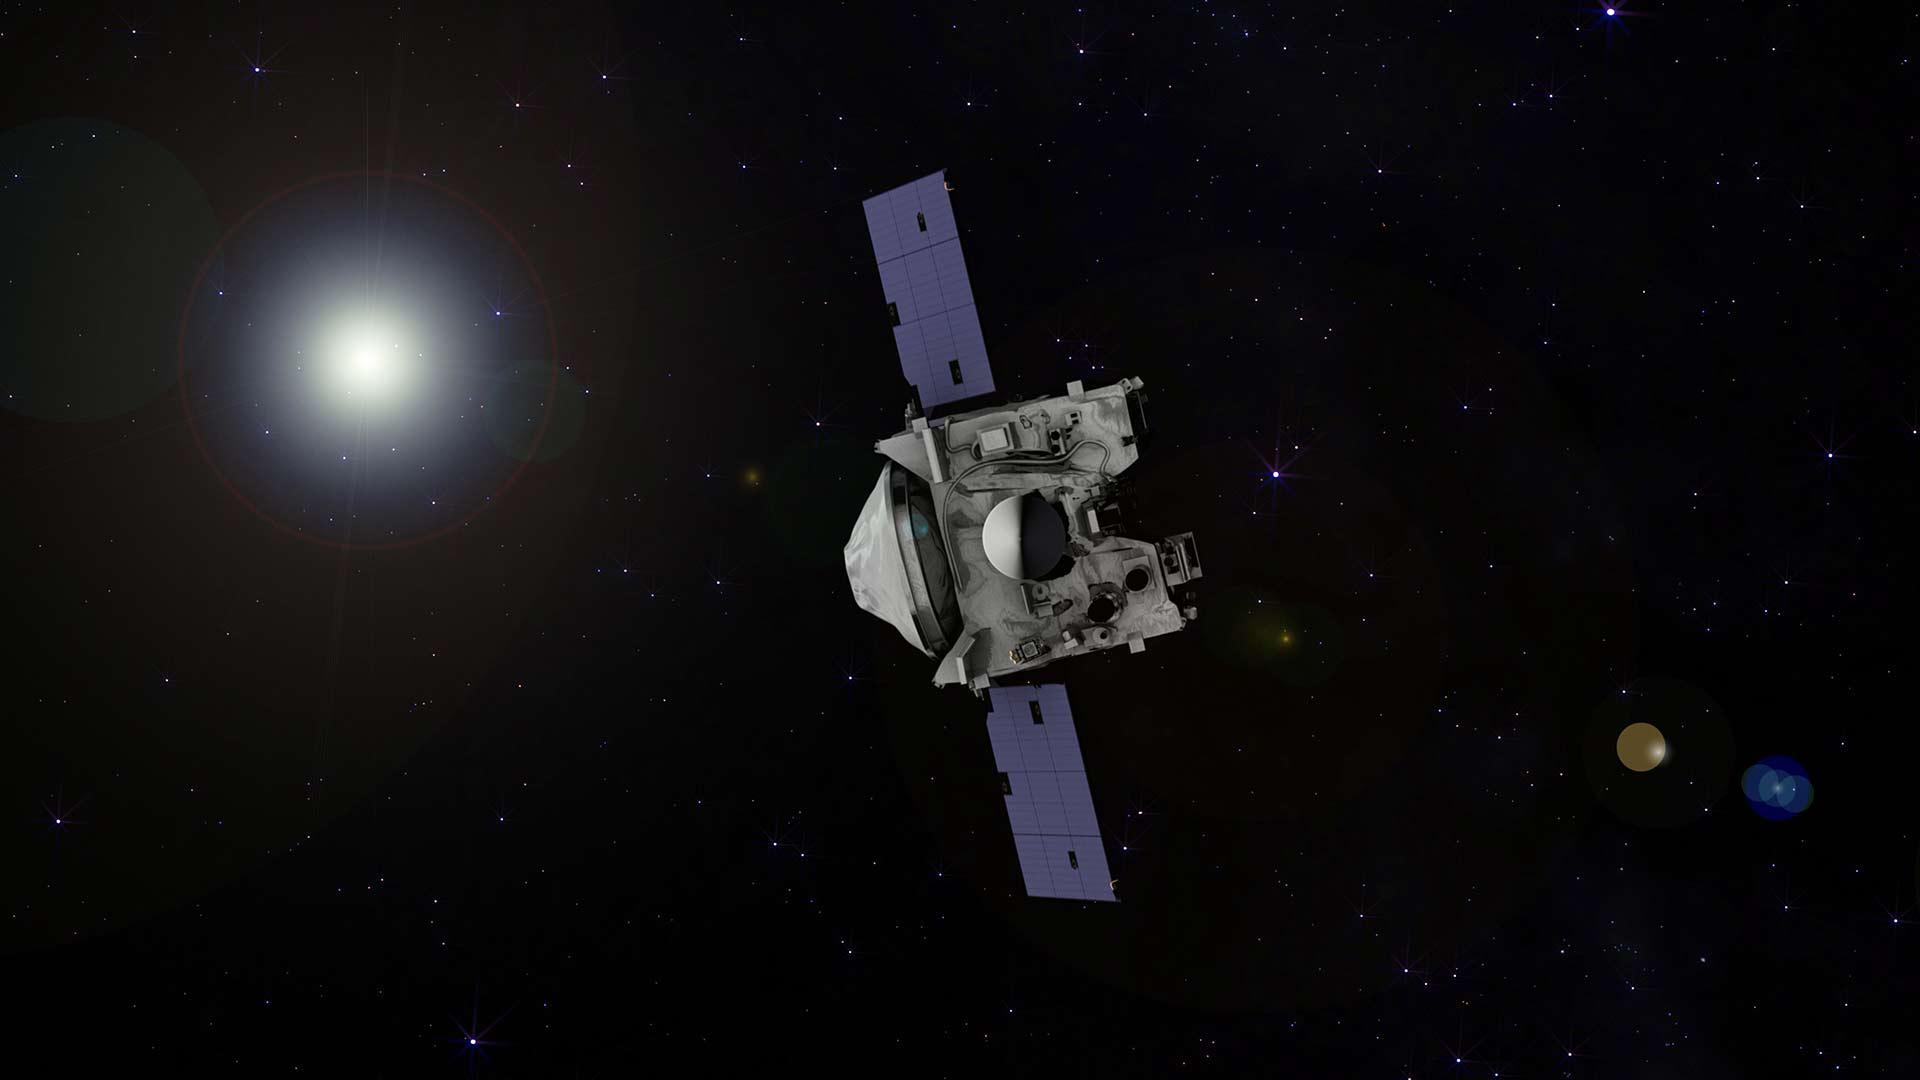 OSIRIS-REx on its return journey to Earth.